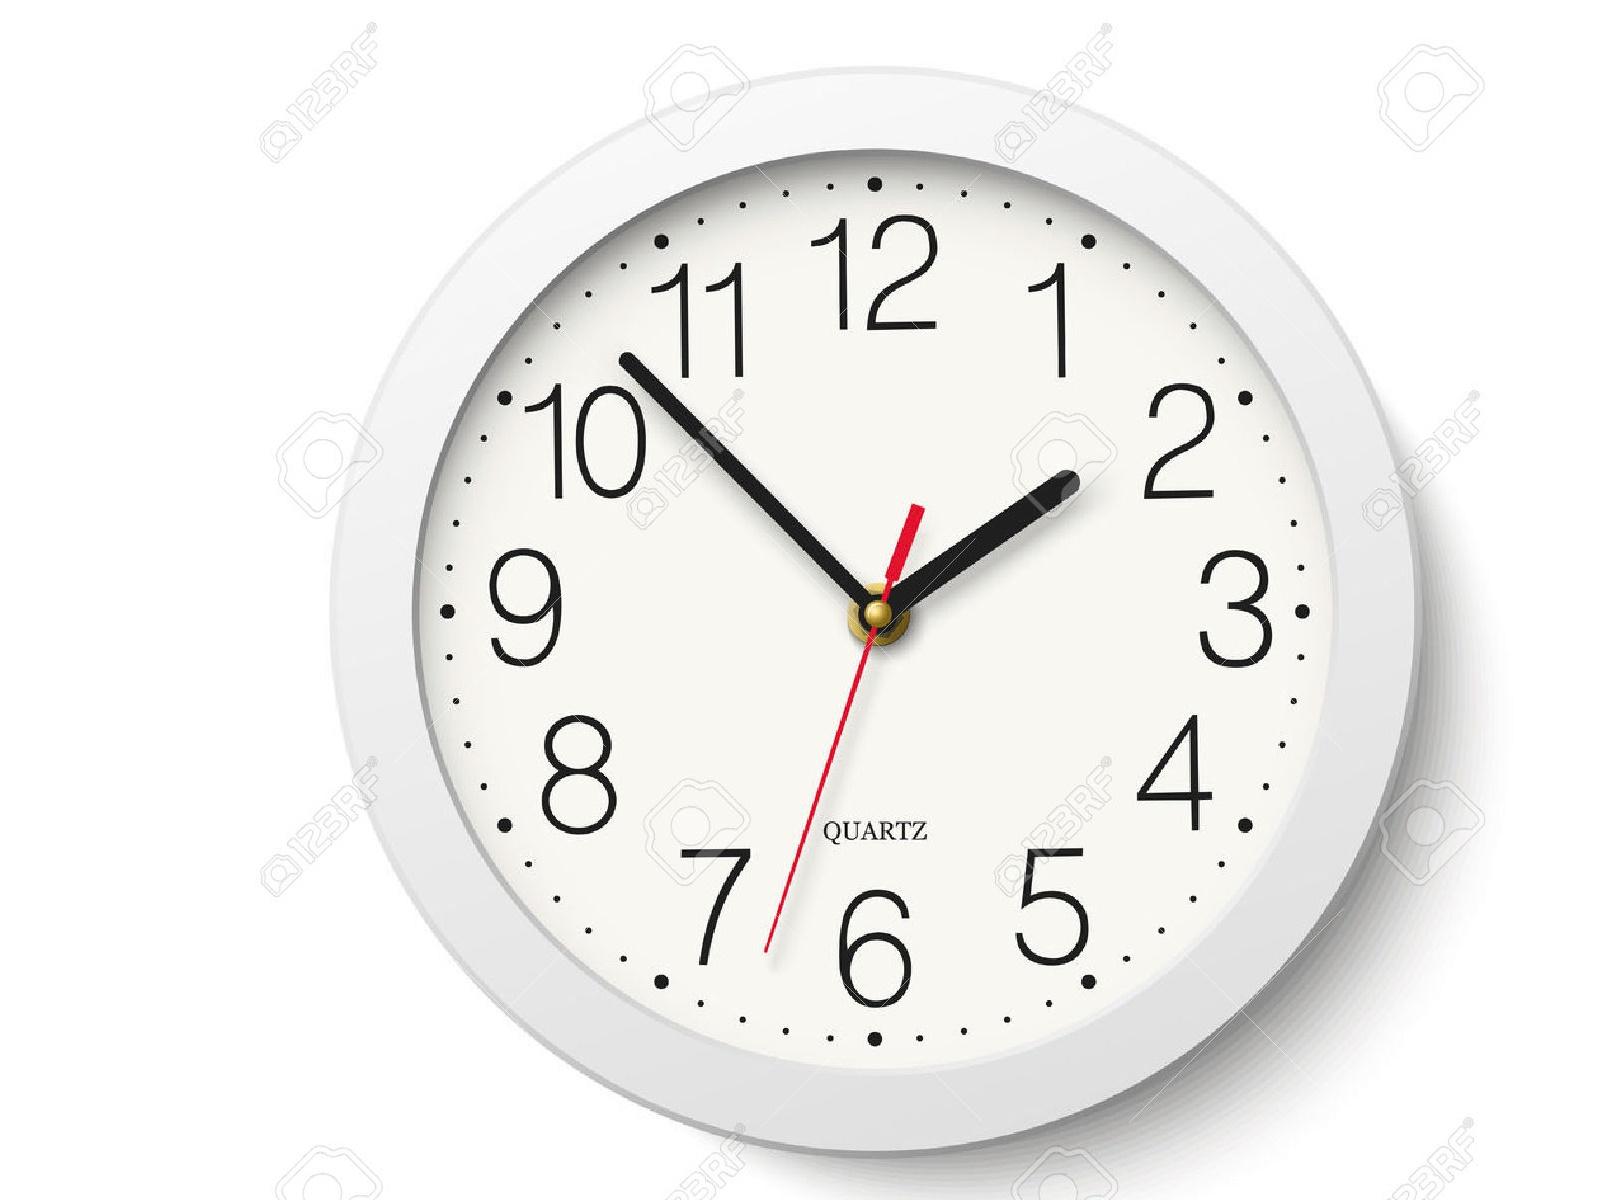 Reloj de pared grande proveedora de oficinas - Reloj grande de pared ...